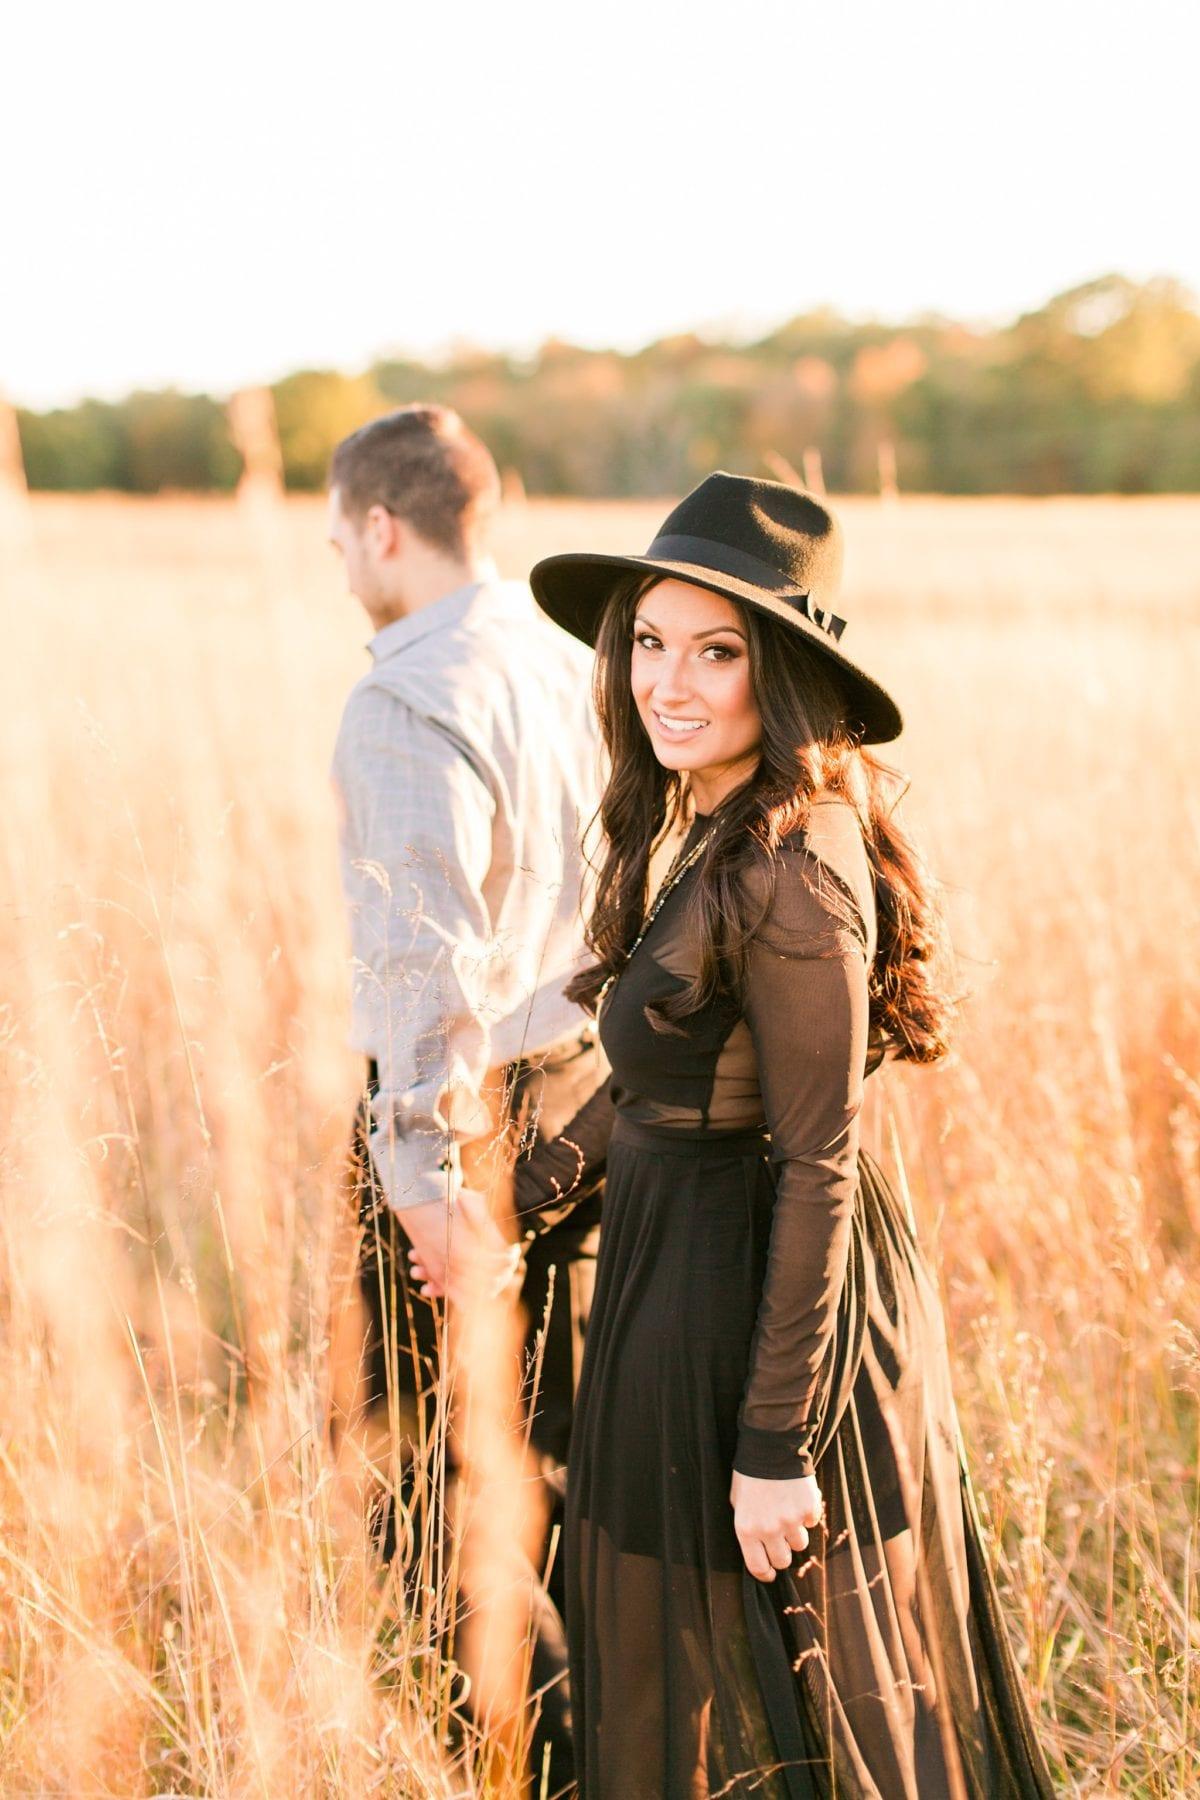 Manassas Battlefield Portraits Virginia Wedding Photographer Megan Kelsey Photography Lianne & Chris-203.jpg